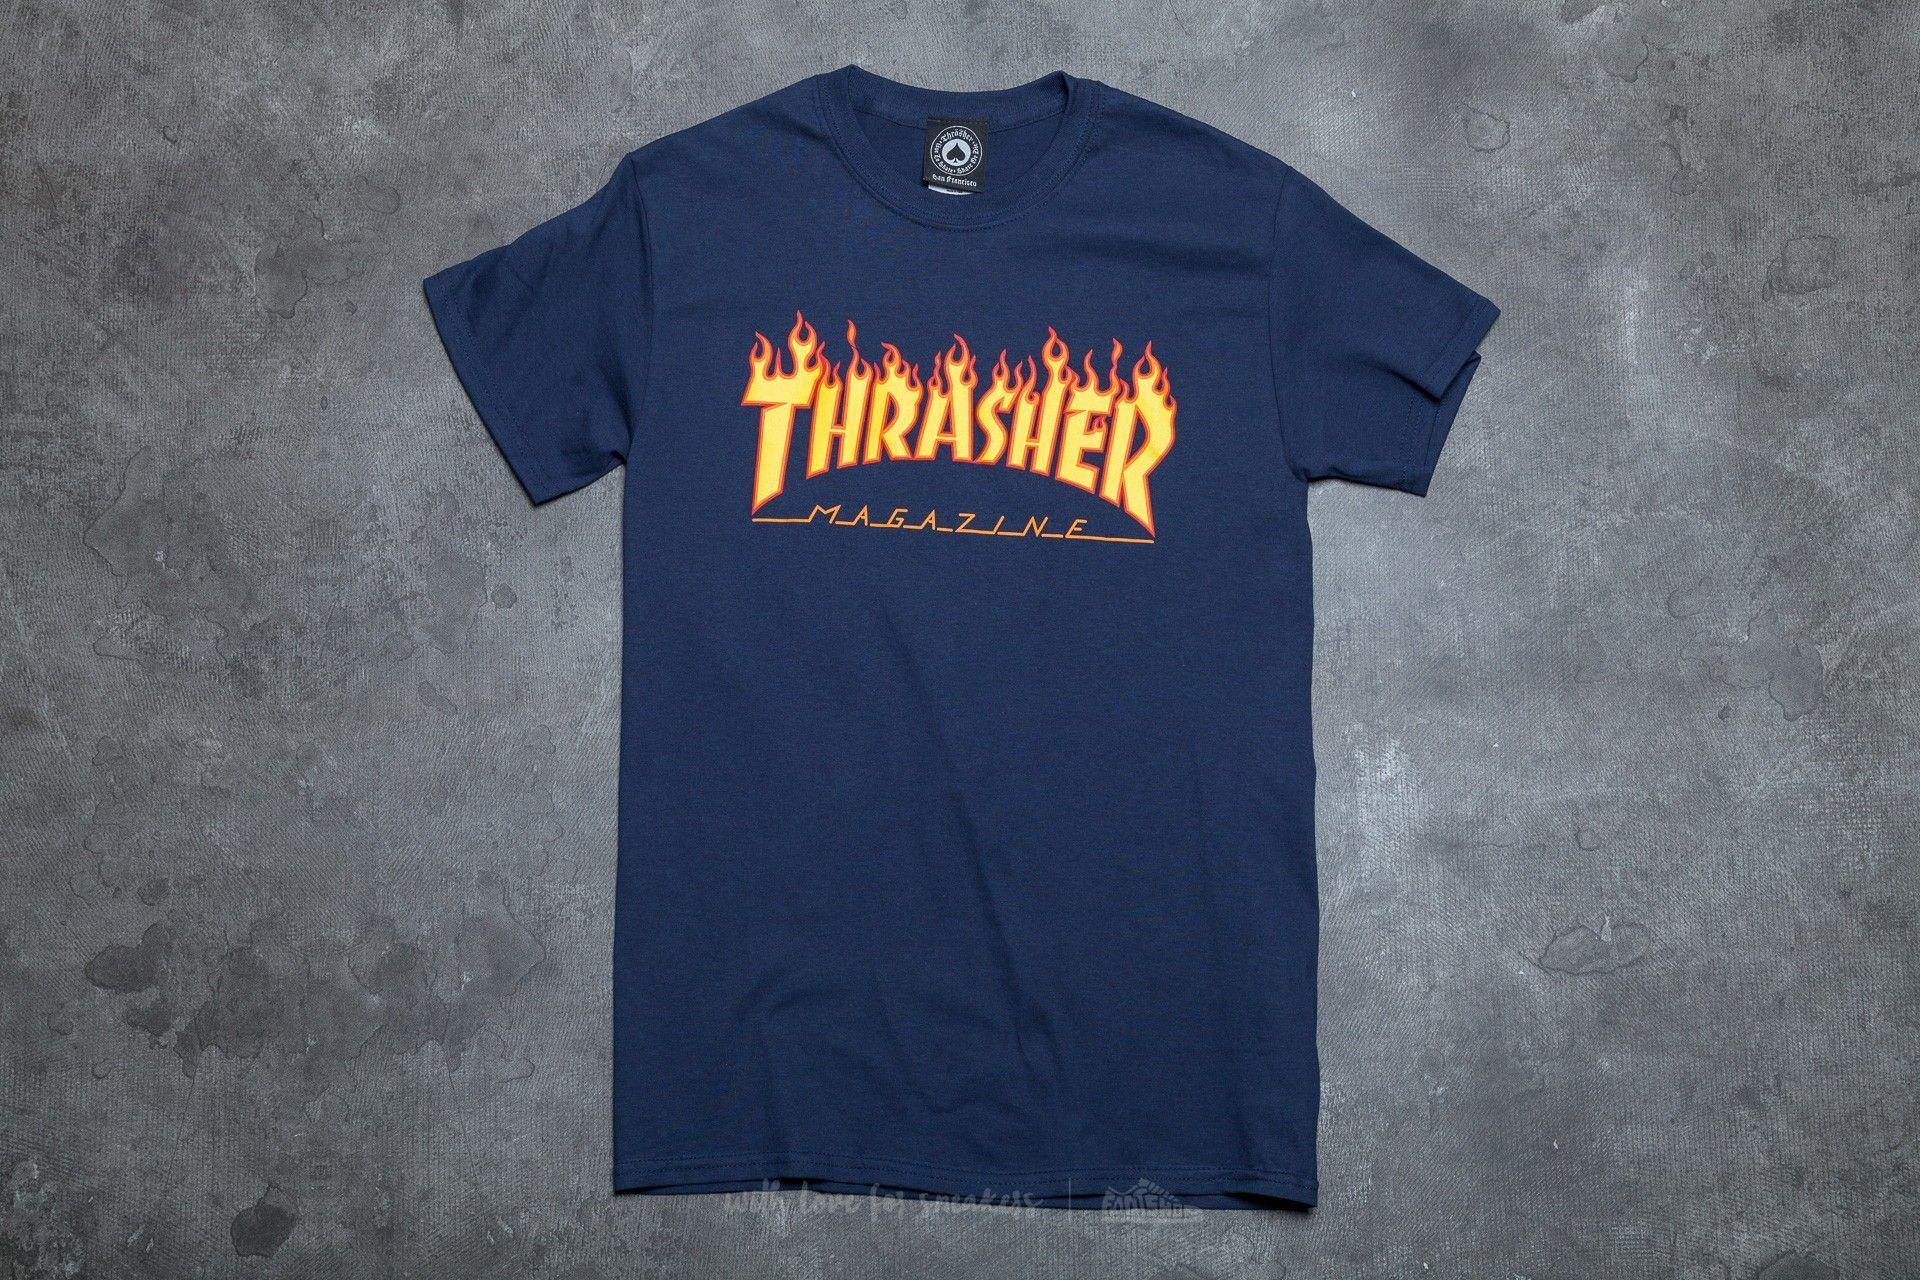 9fd06d8786d2 Blue G with Flame Logo - Thrasher Flame Logo T-Shirt Navy Blue | Footshop